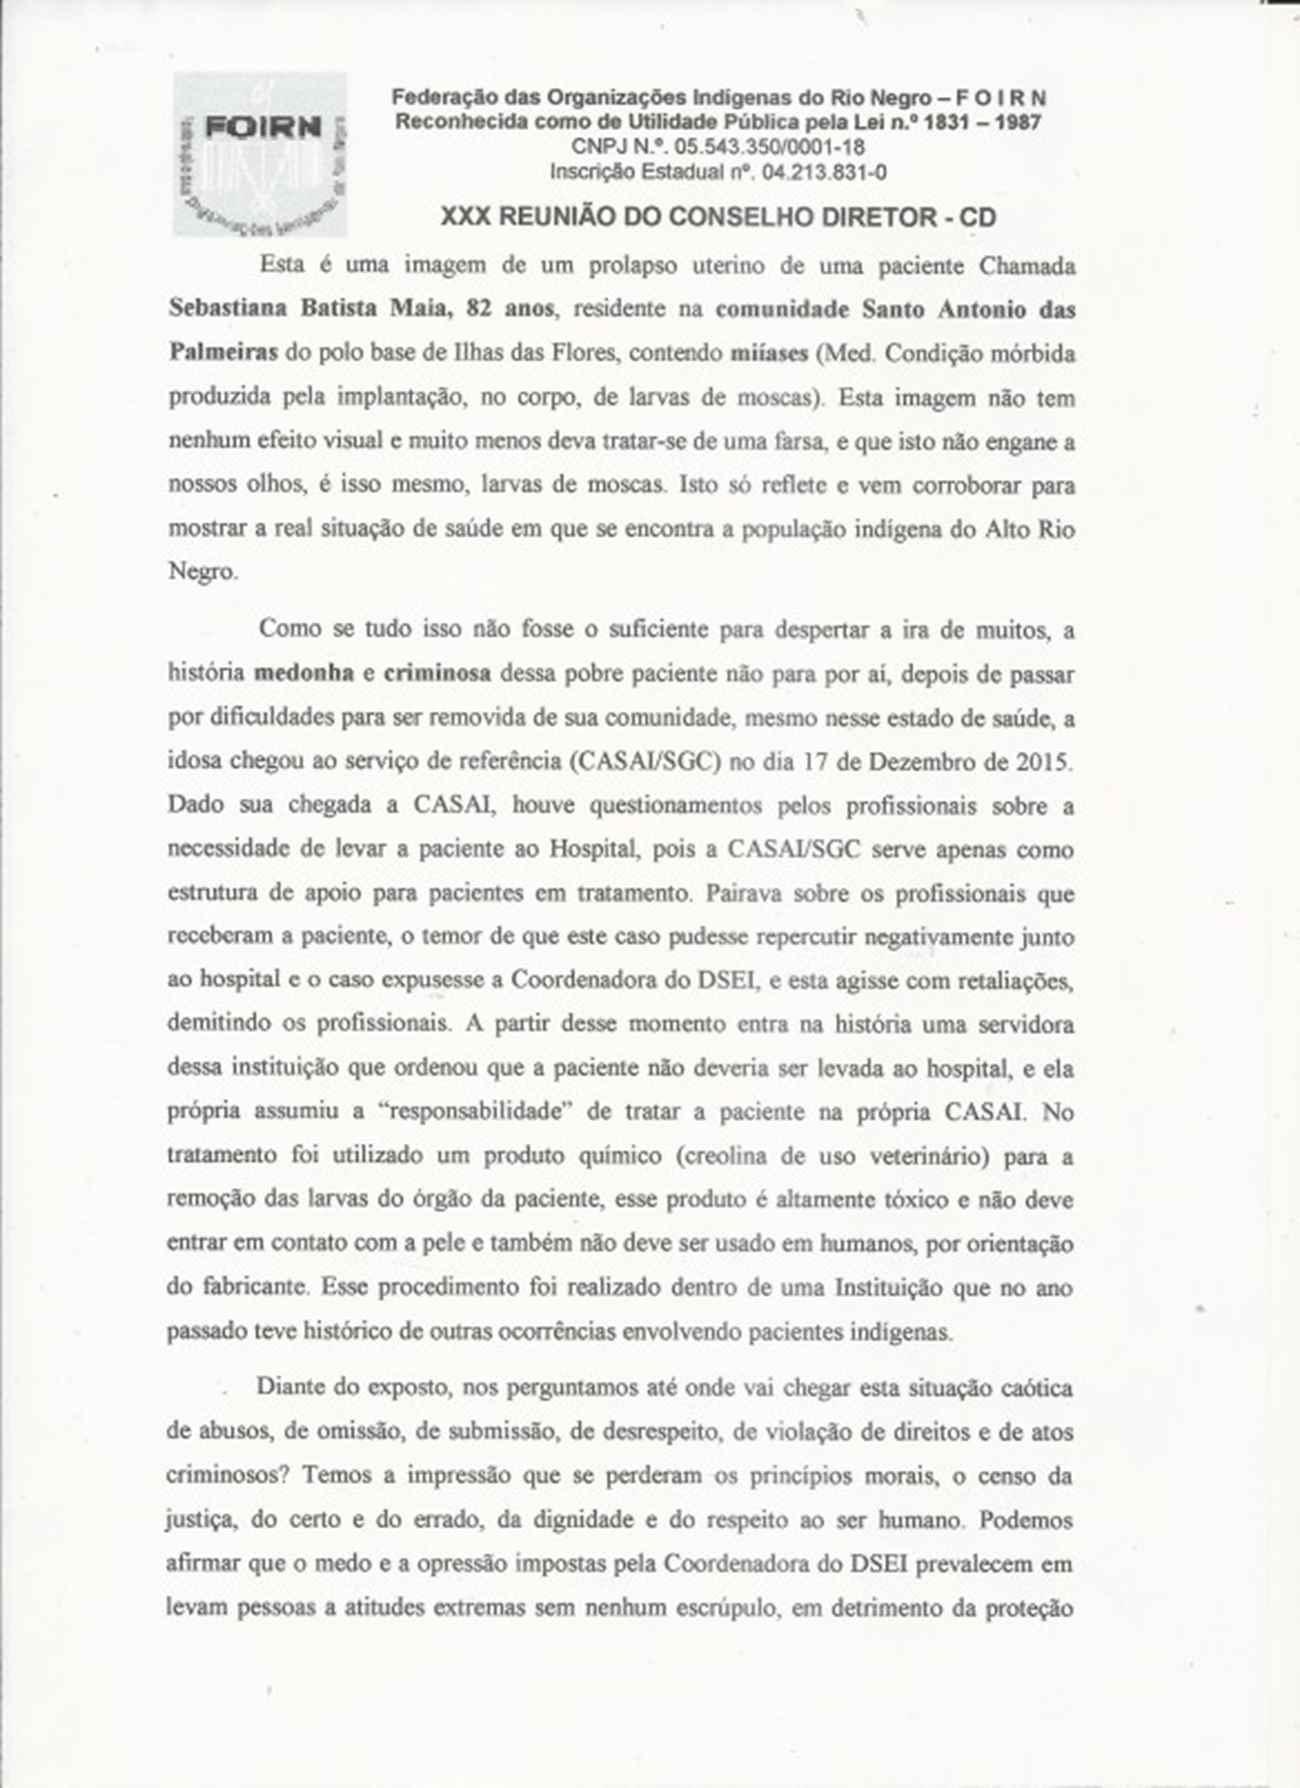 carta-foirn-3